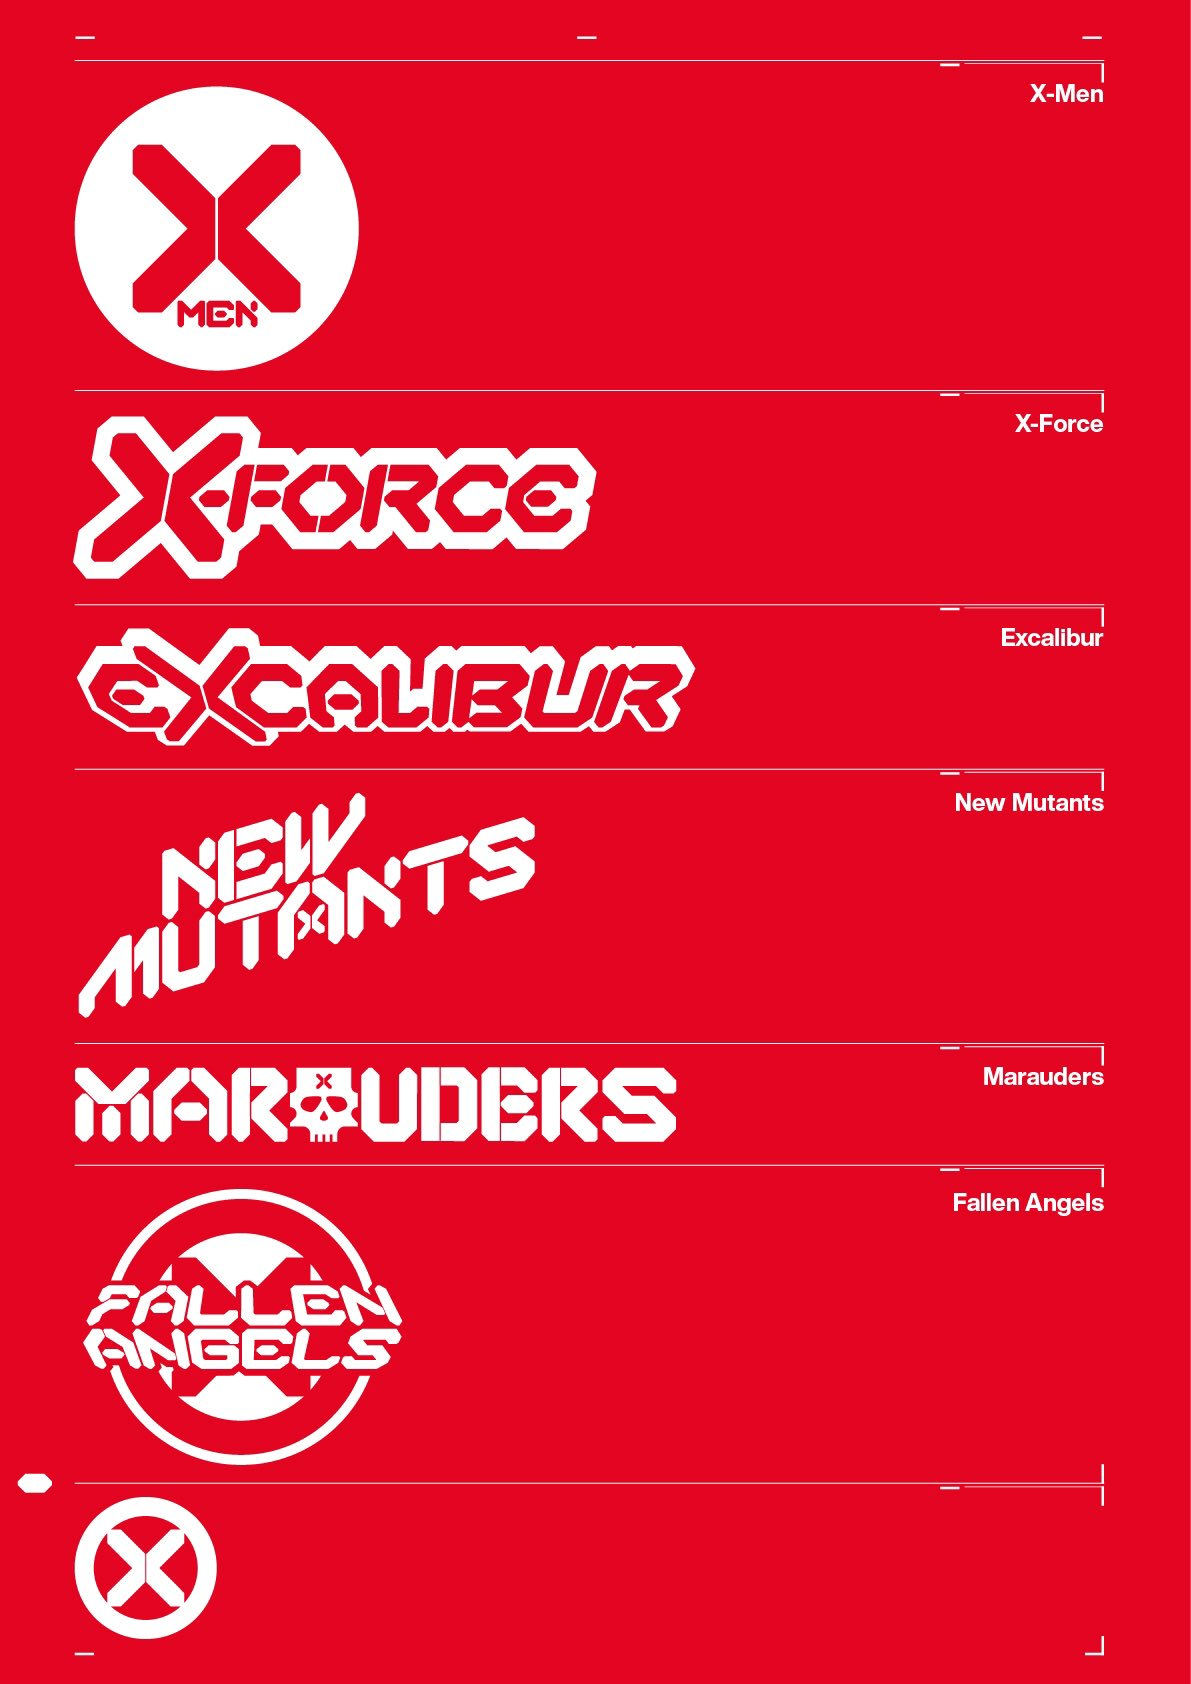 Marvel Comics na SDCC 2019 - X-Men - logos - Blog Farofeiros